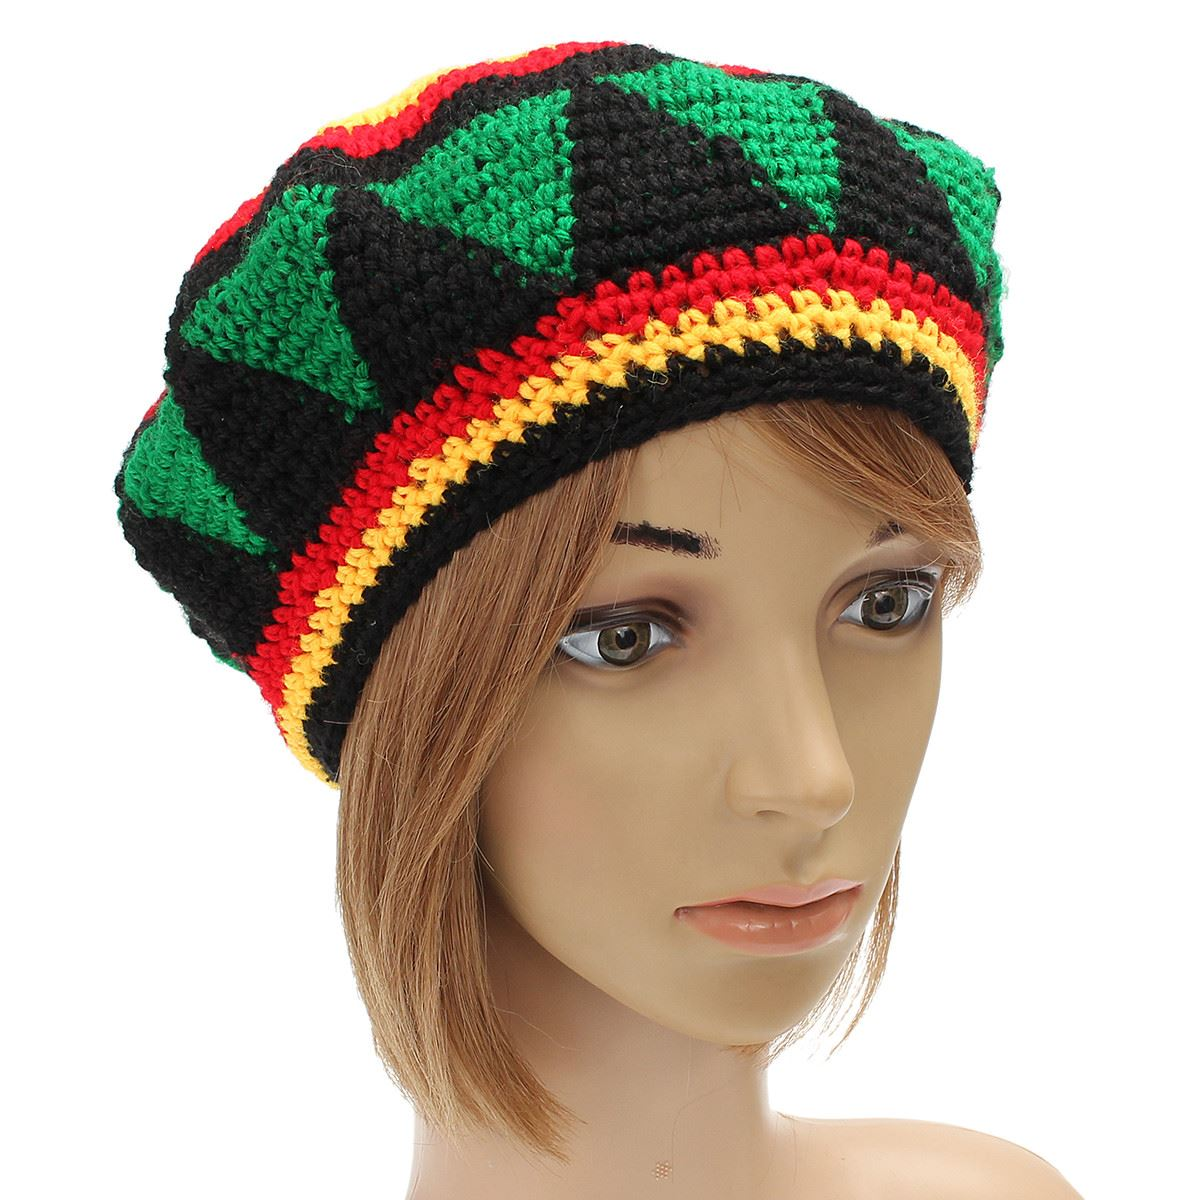 раста шапка схема вязки на русском языке